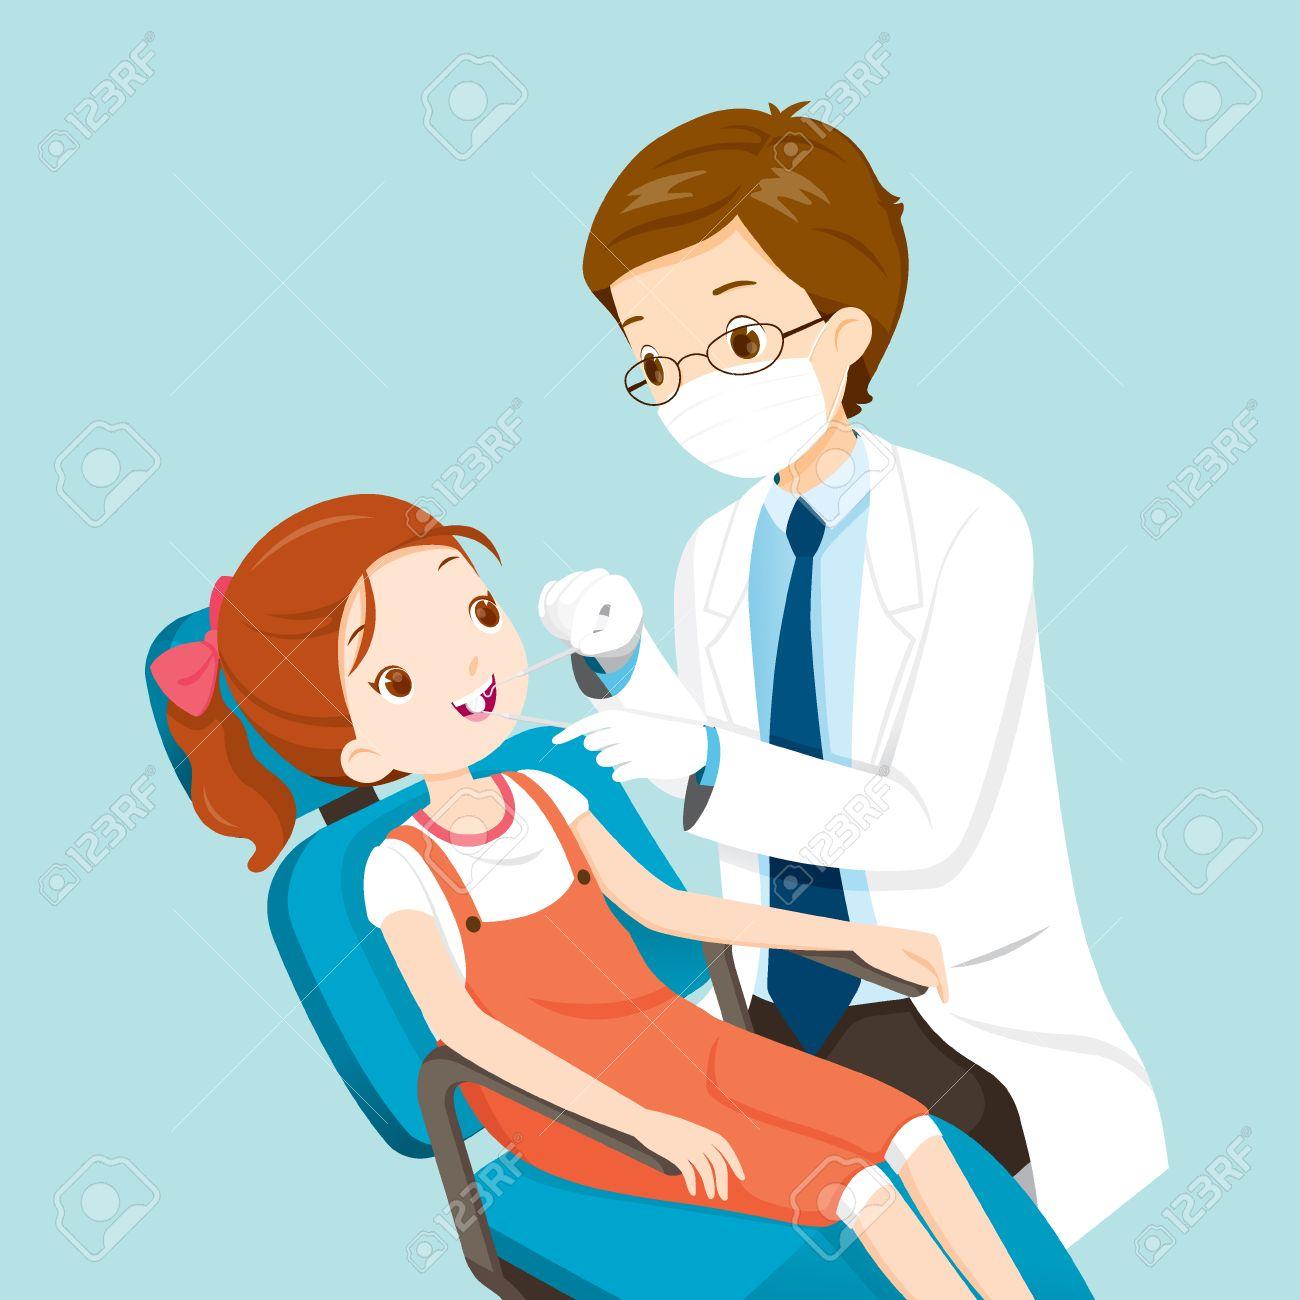 Dentist And Cute Girl On Dental Chair Medical Dentistry Hospital Checkup